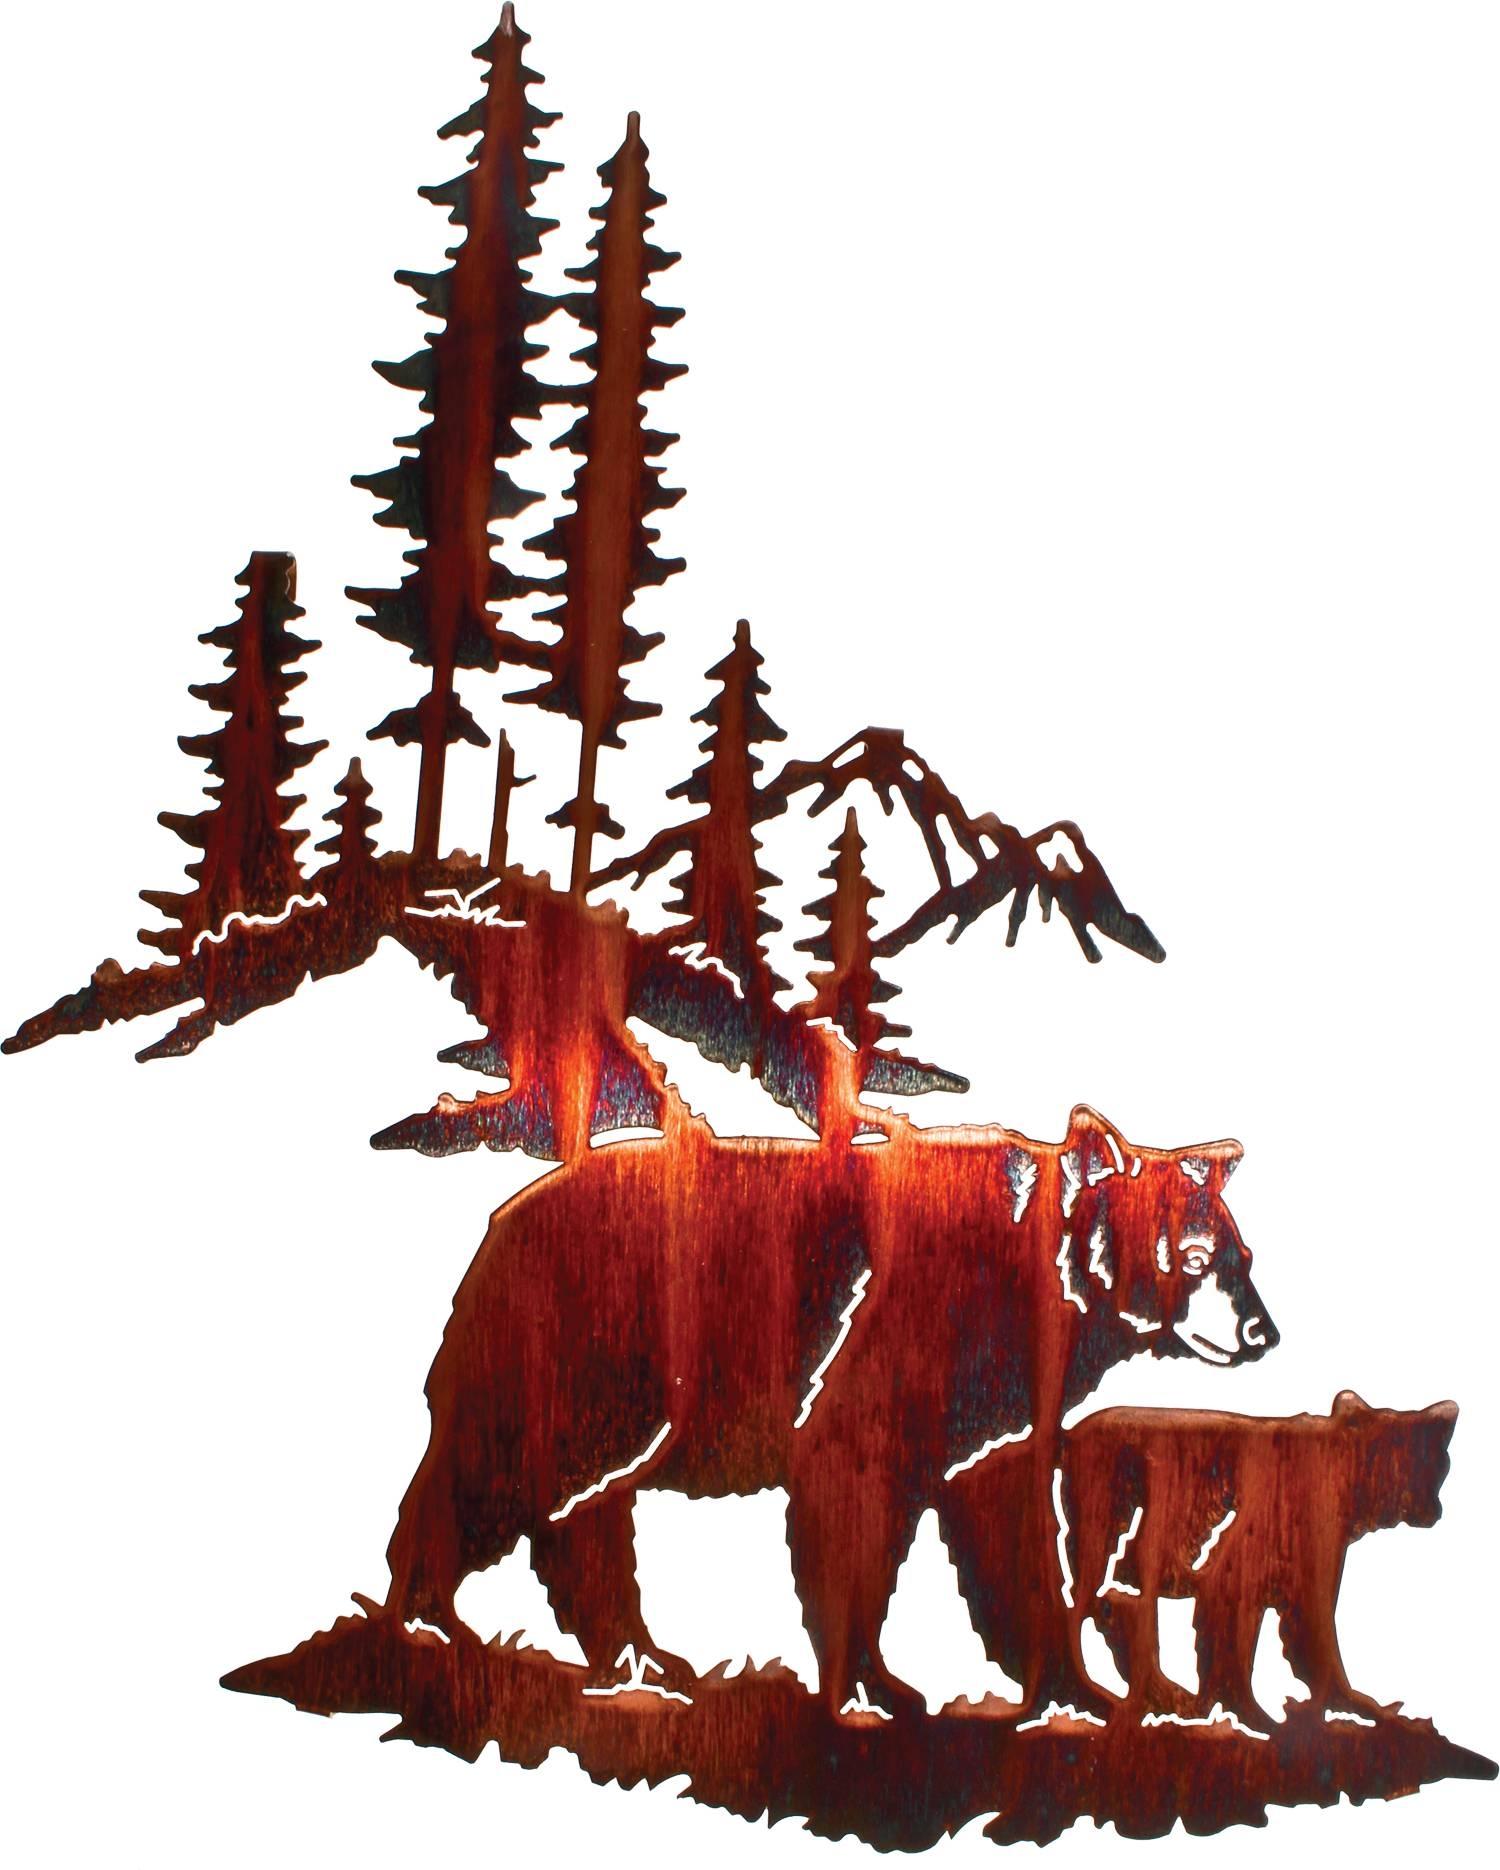 Bear Wall Art, Bear Wall Hangings, Metal Wall Sculptures Pertaining To Newest Bear Metal Wall Art (View 16 of 20)